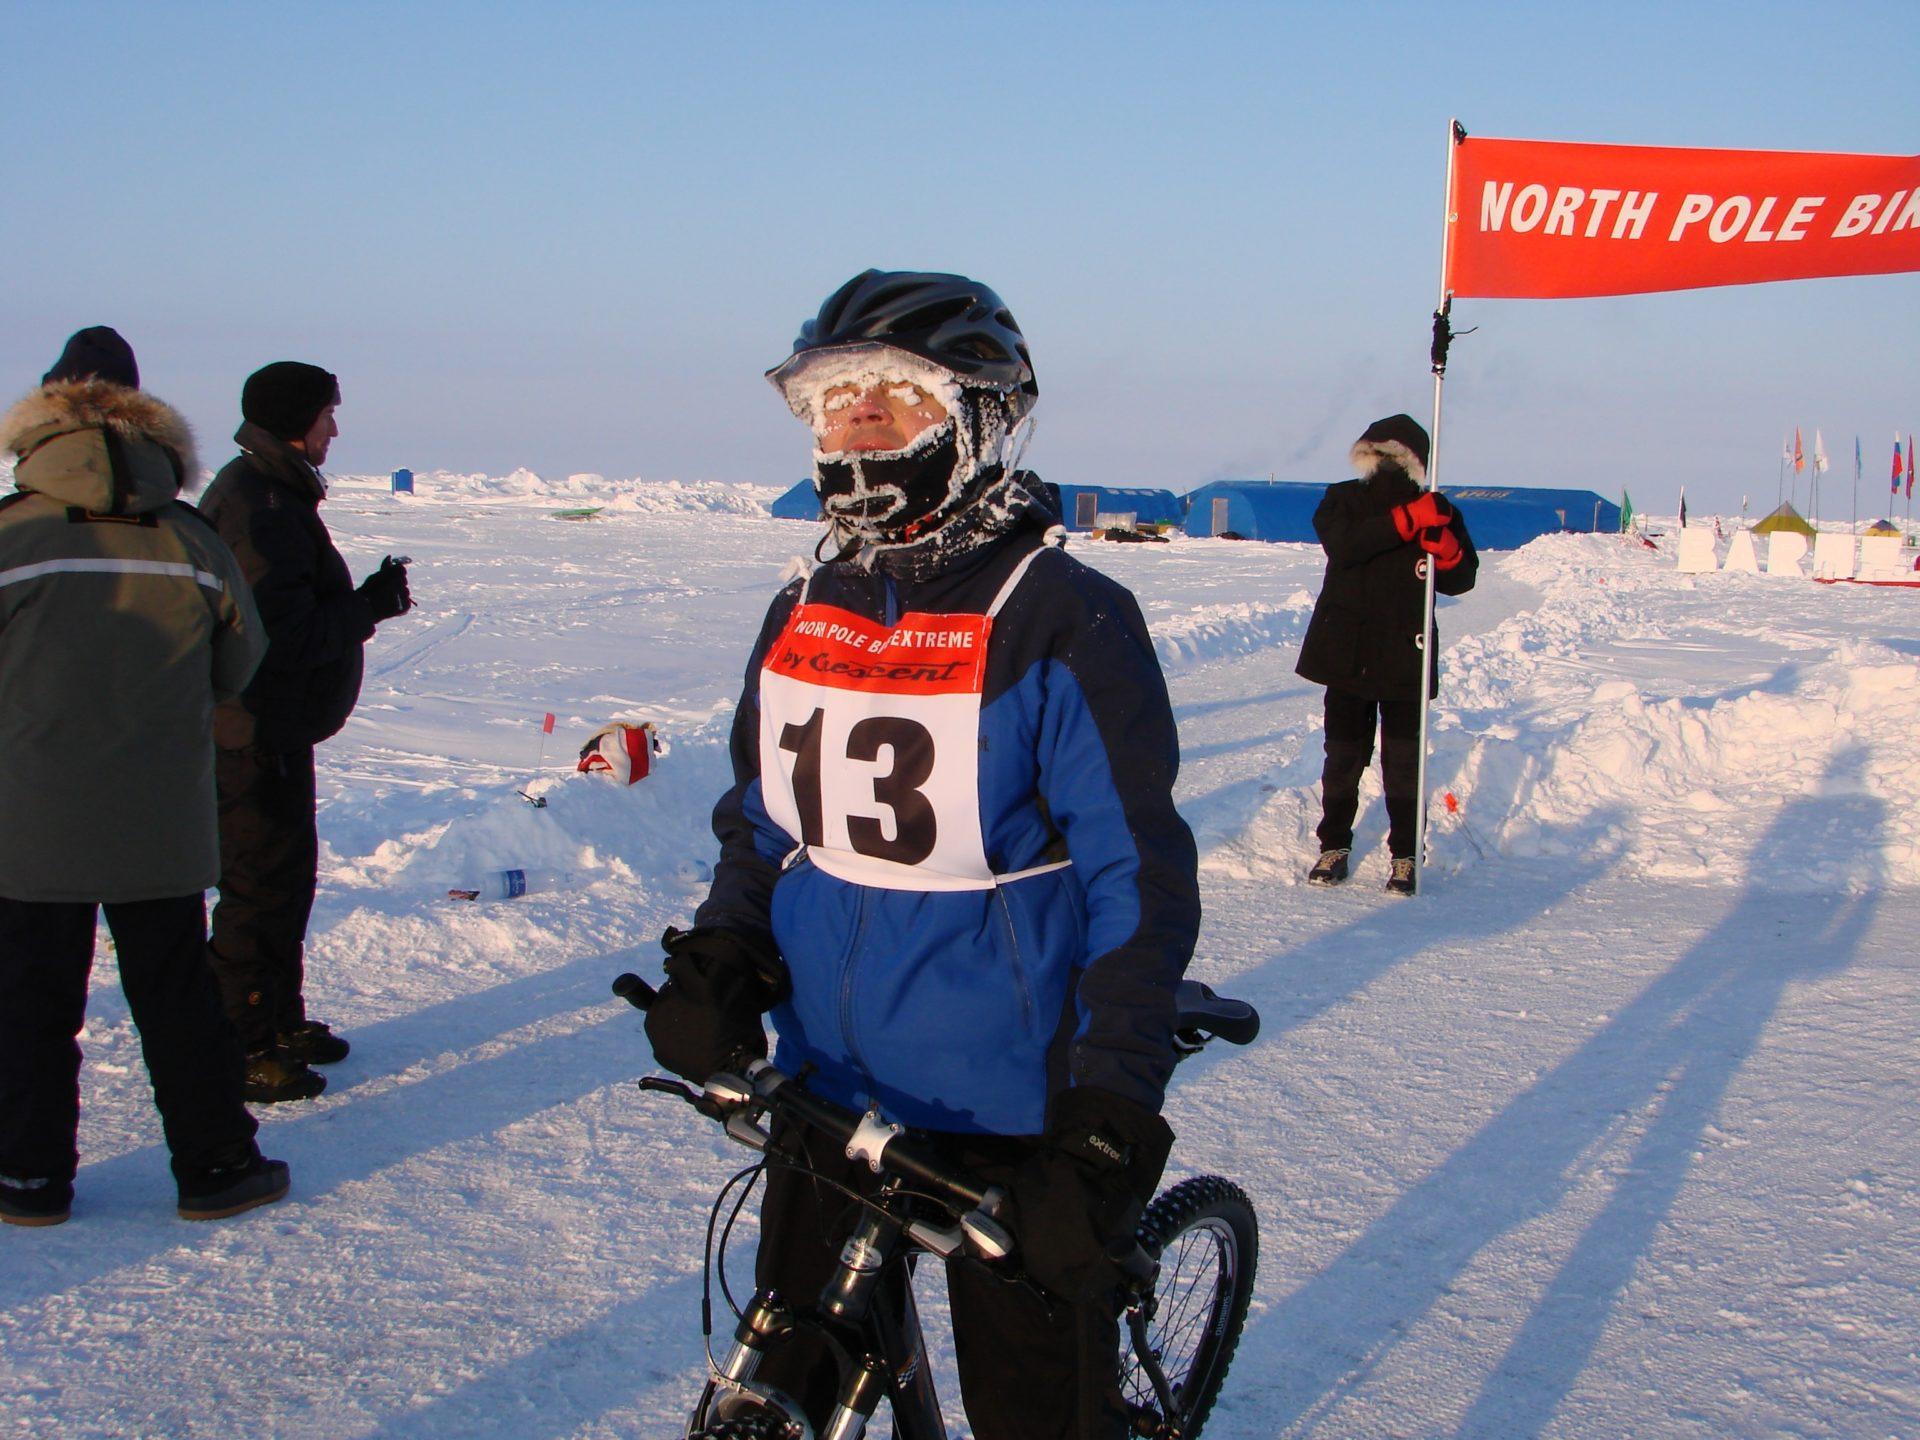 Jukka about to bike a marathon on the North Pole